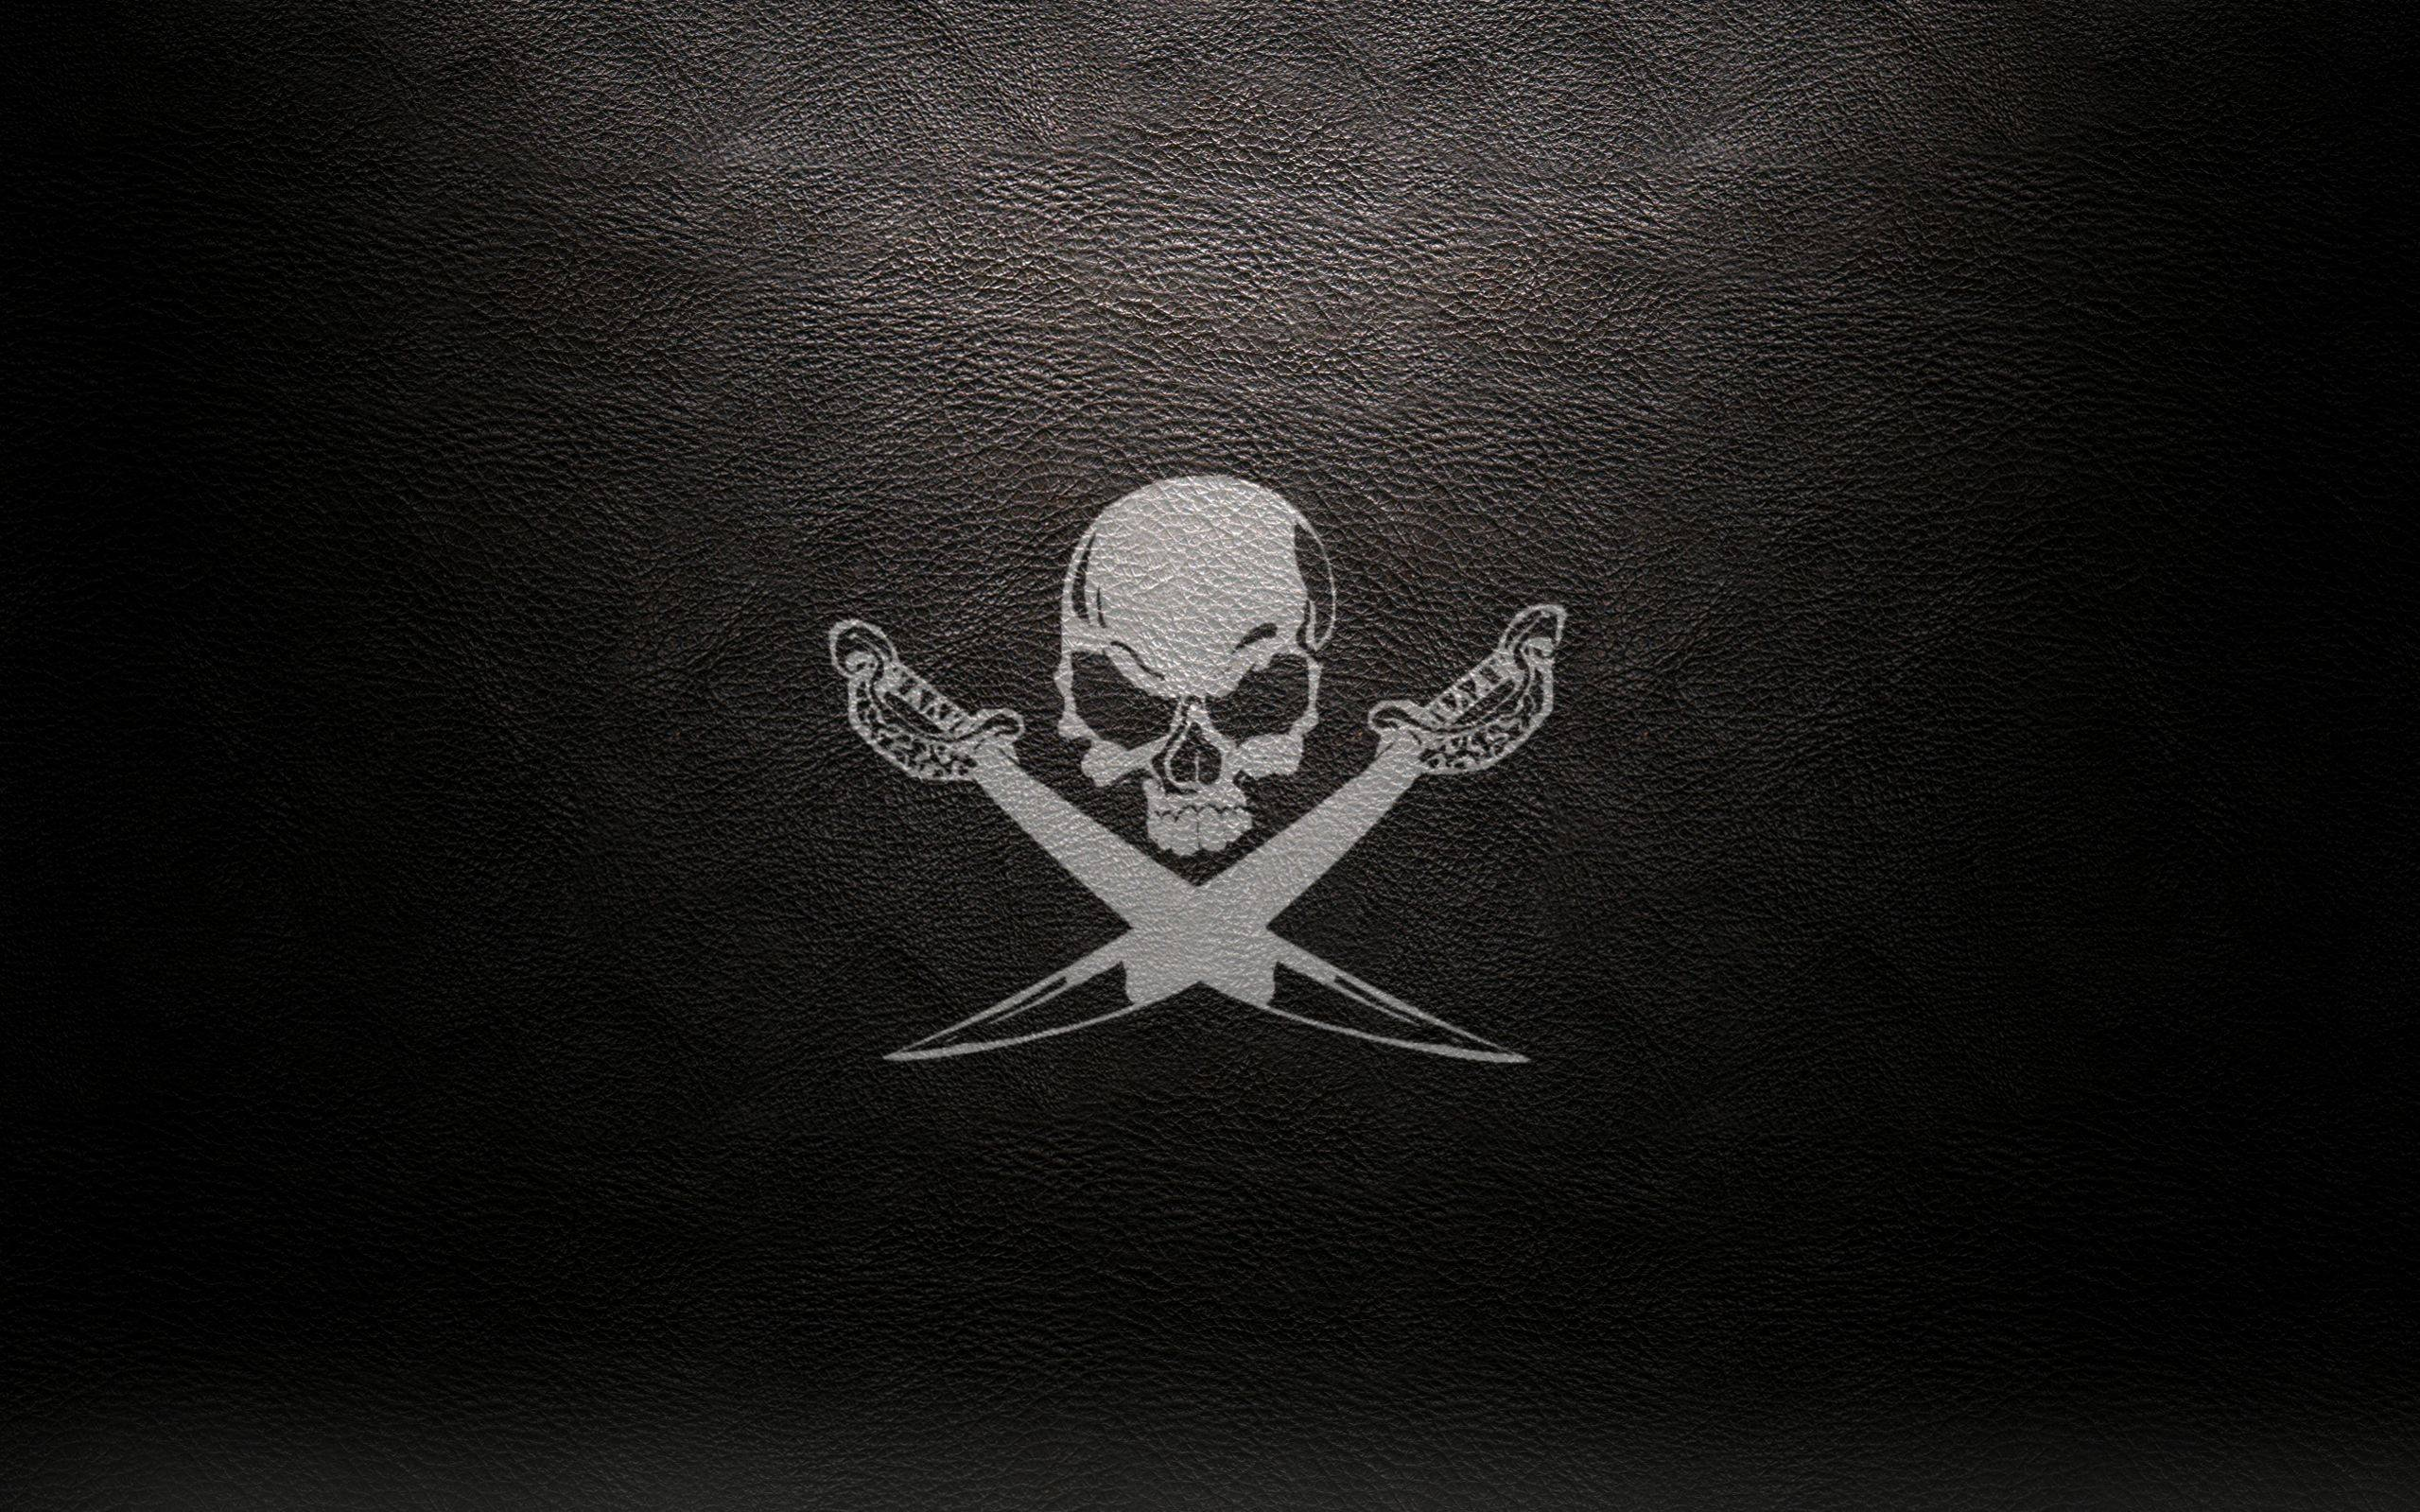 wallpapers pirate - wallpaper cave